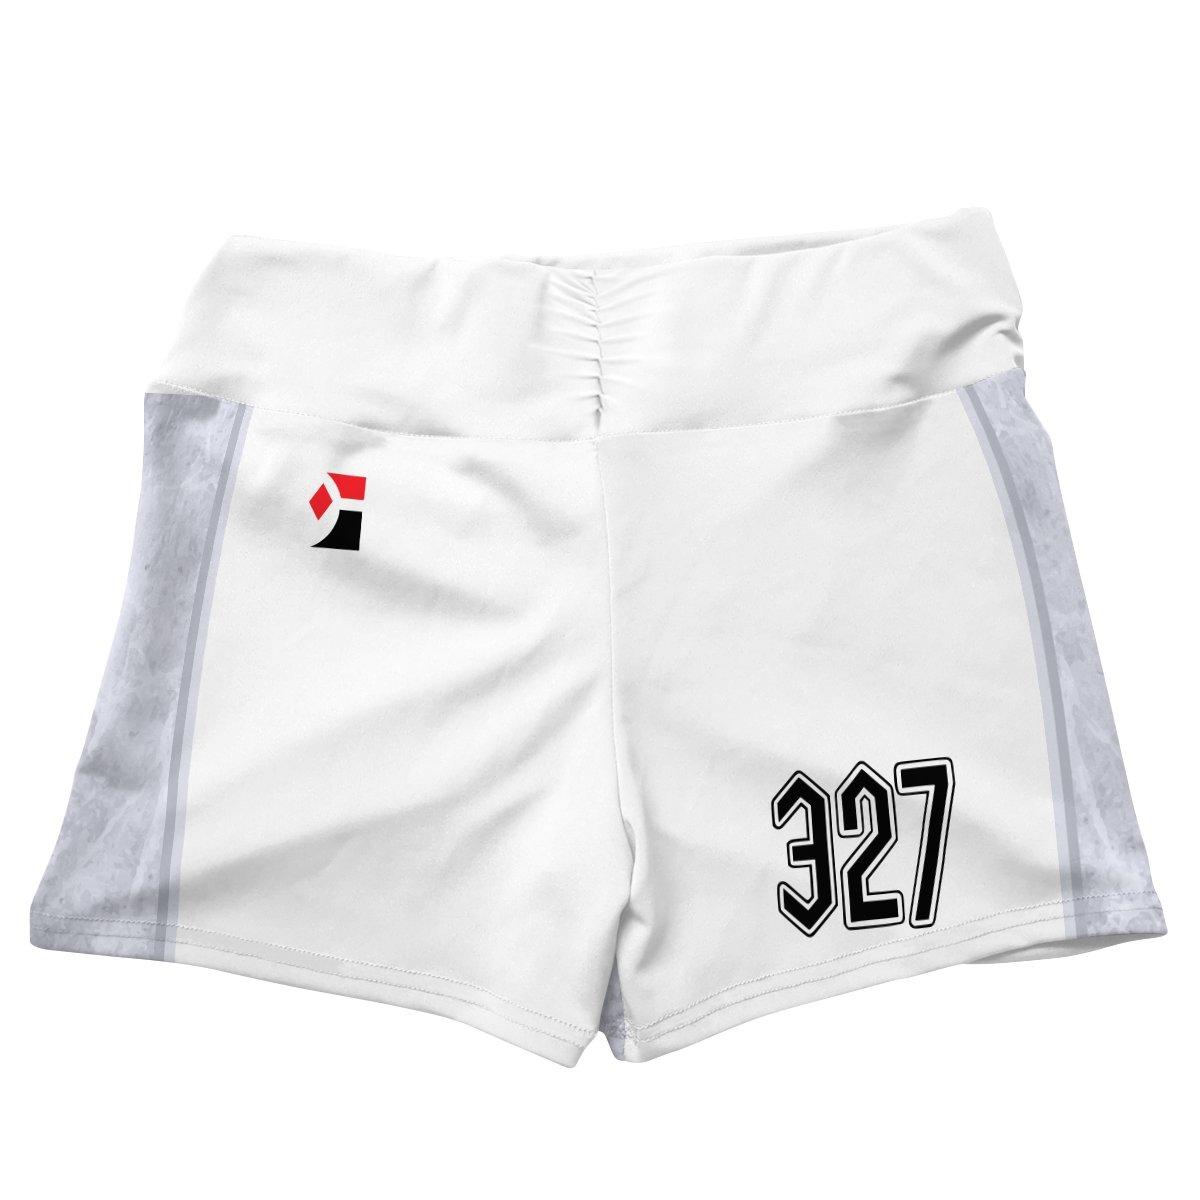 pokemon ice uniform active wear set 216104 - Anime Swimsuits